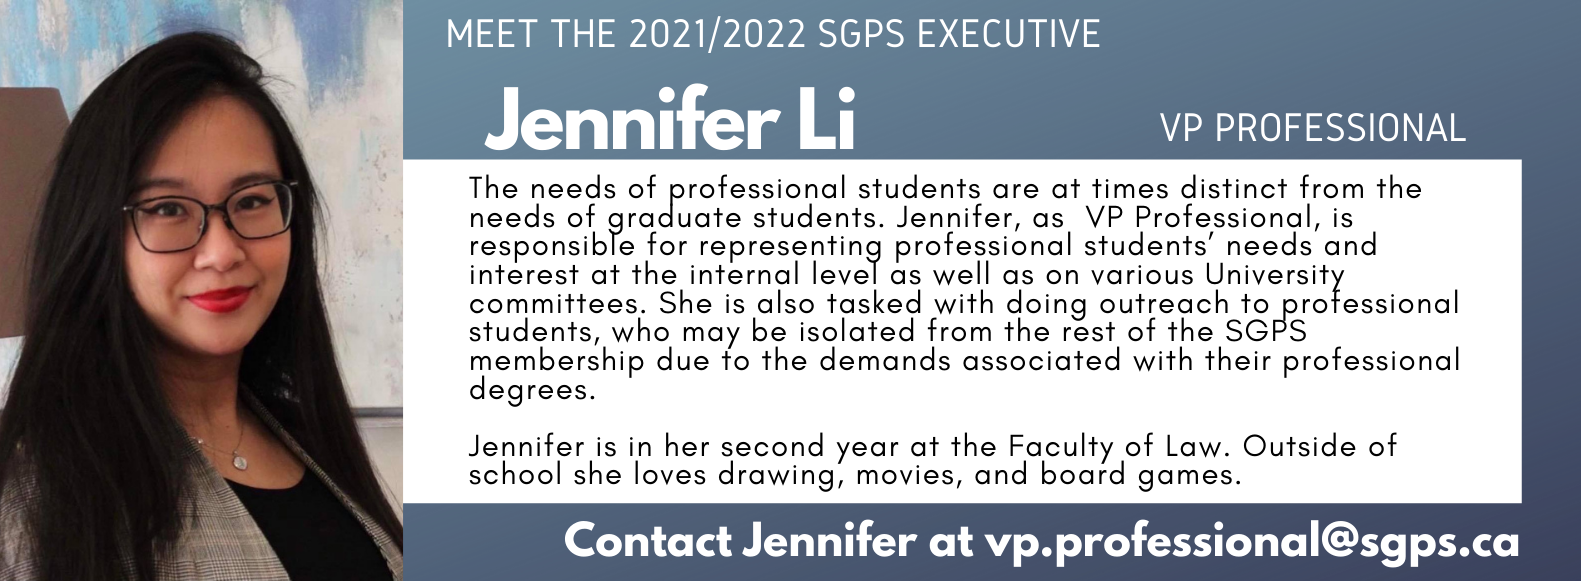 Jennifer Li, SGPS Vice President Professional. Contact Jennifer vp.professional@sgps.ca